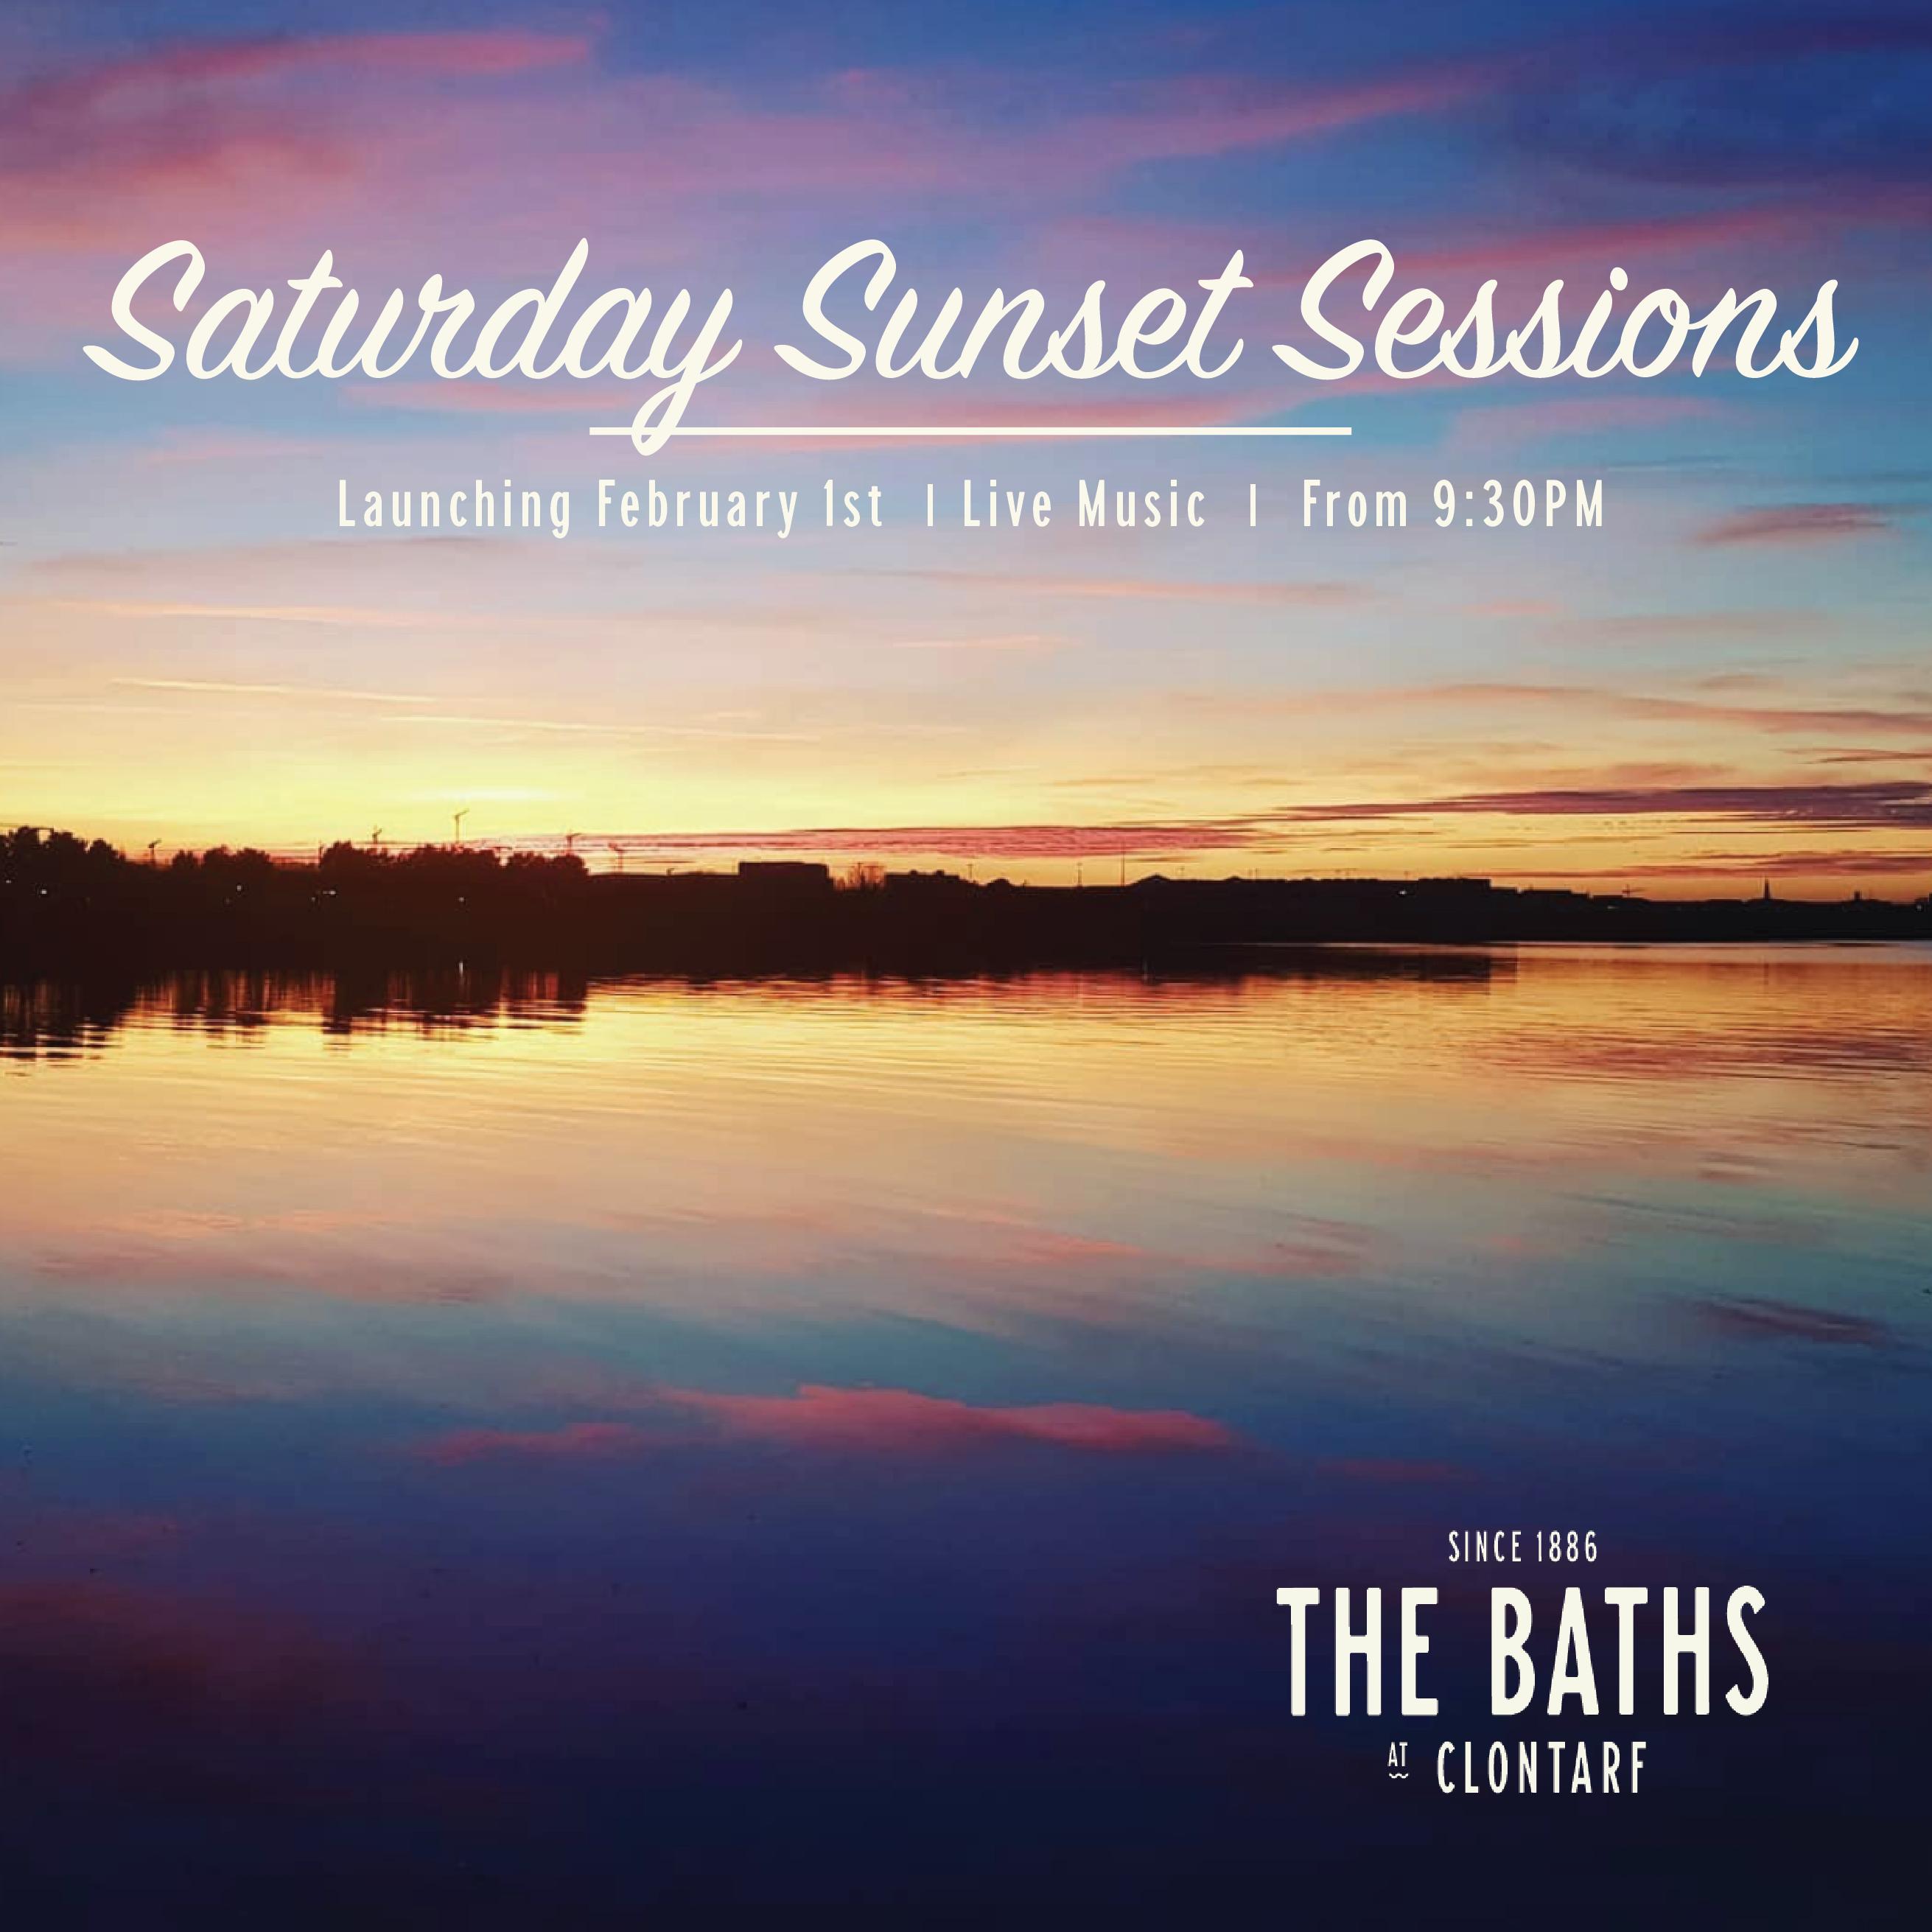 Sunday Sunset Session Ad